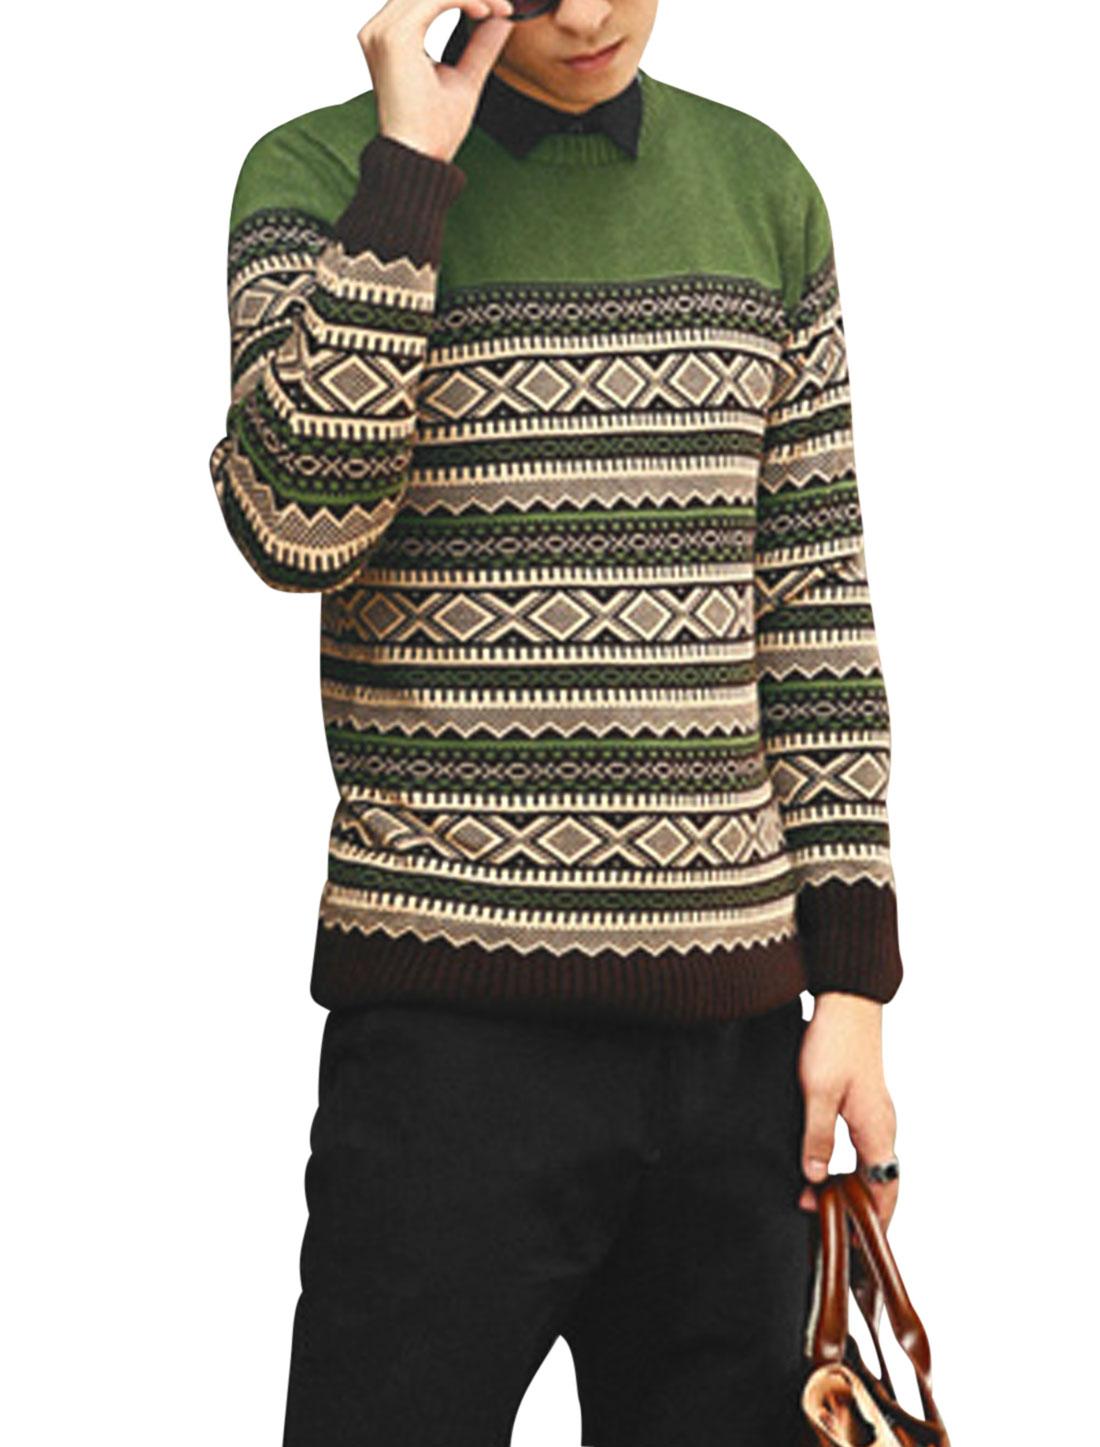 Men Cozy Fit Argyle Pattern Zigzag Pattern Ribbed Hem Sweater Light Green S